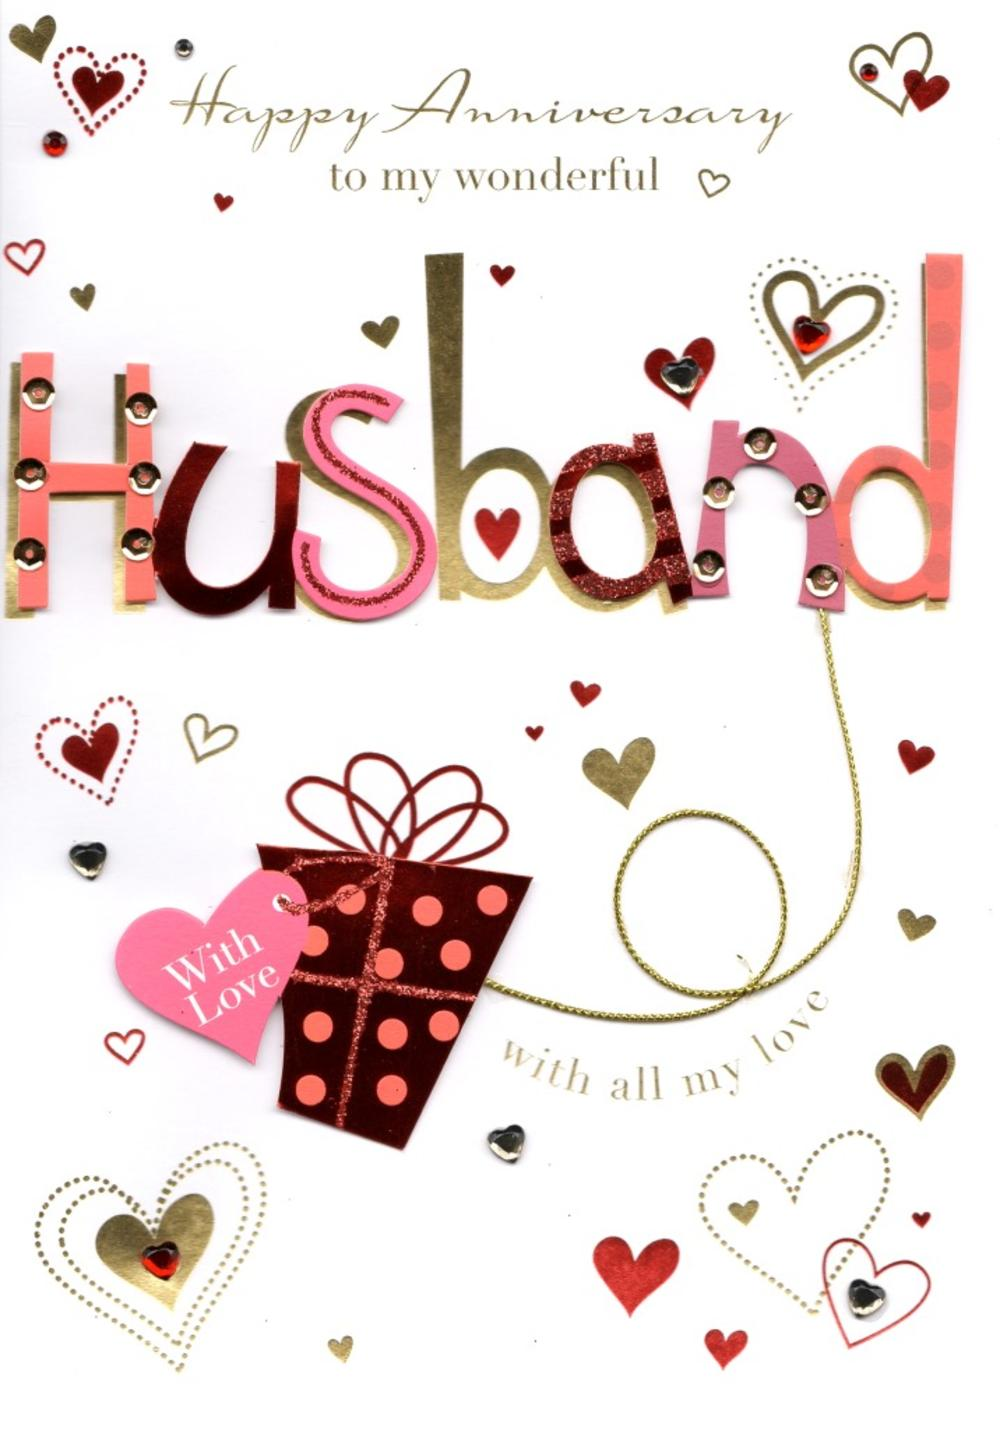 Black Silver Glitter Wallpaper To My Wonderful Husband Happy Anniversary Greeting Card